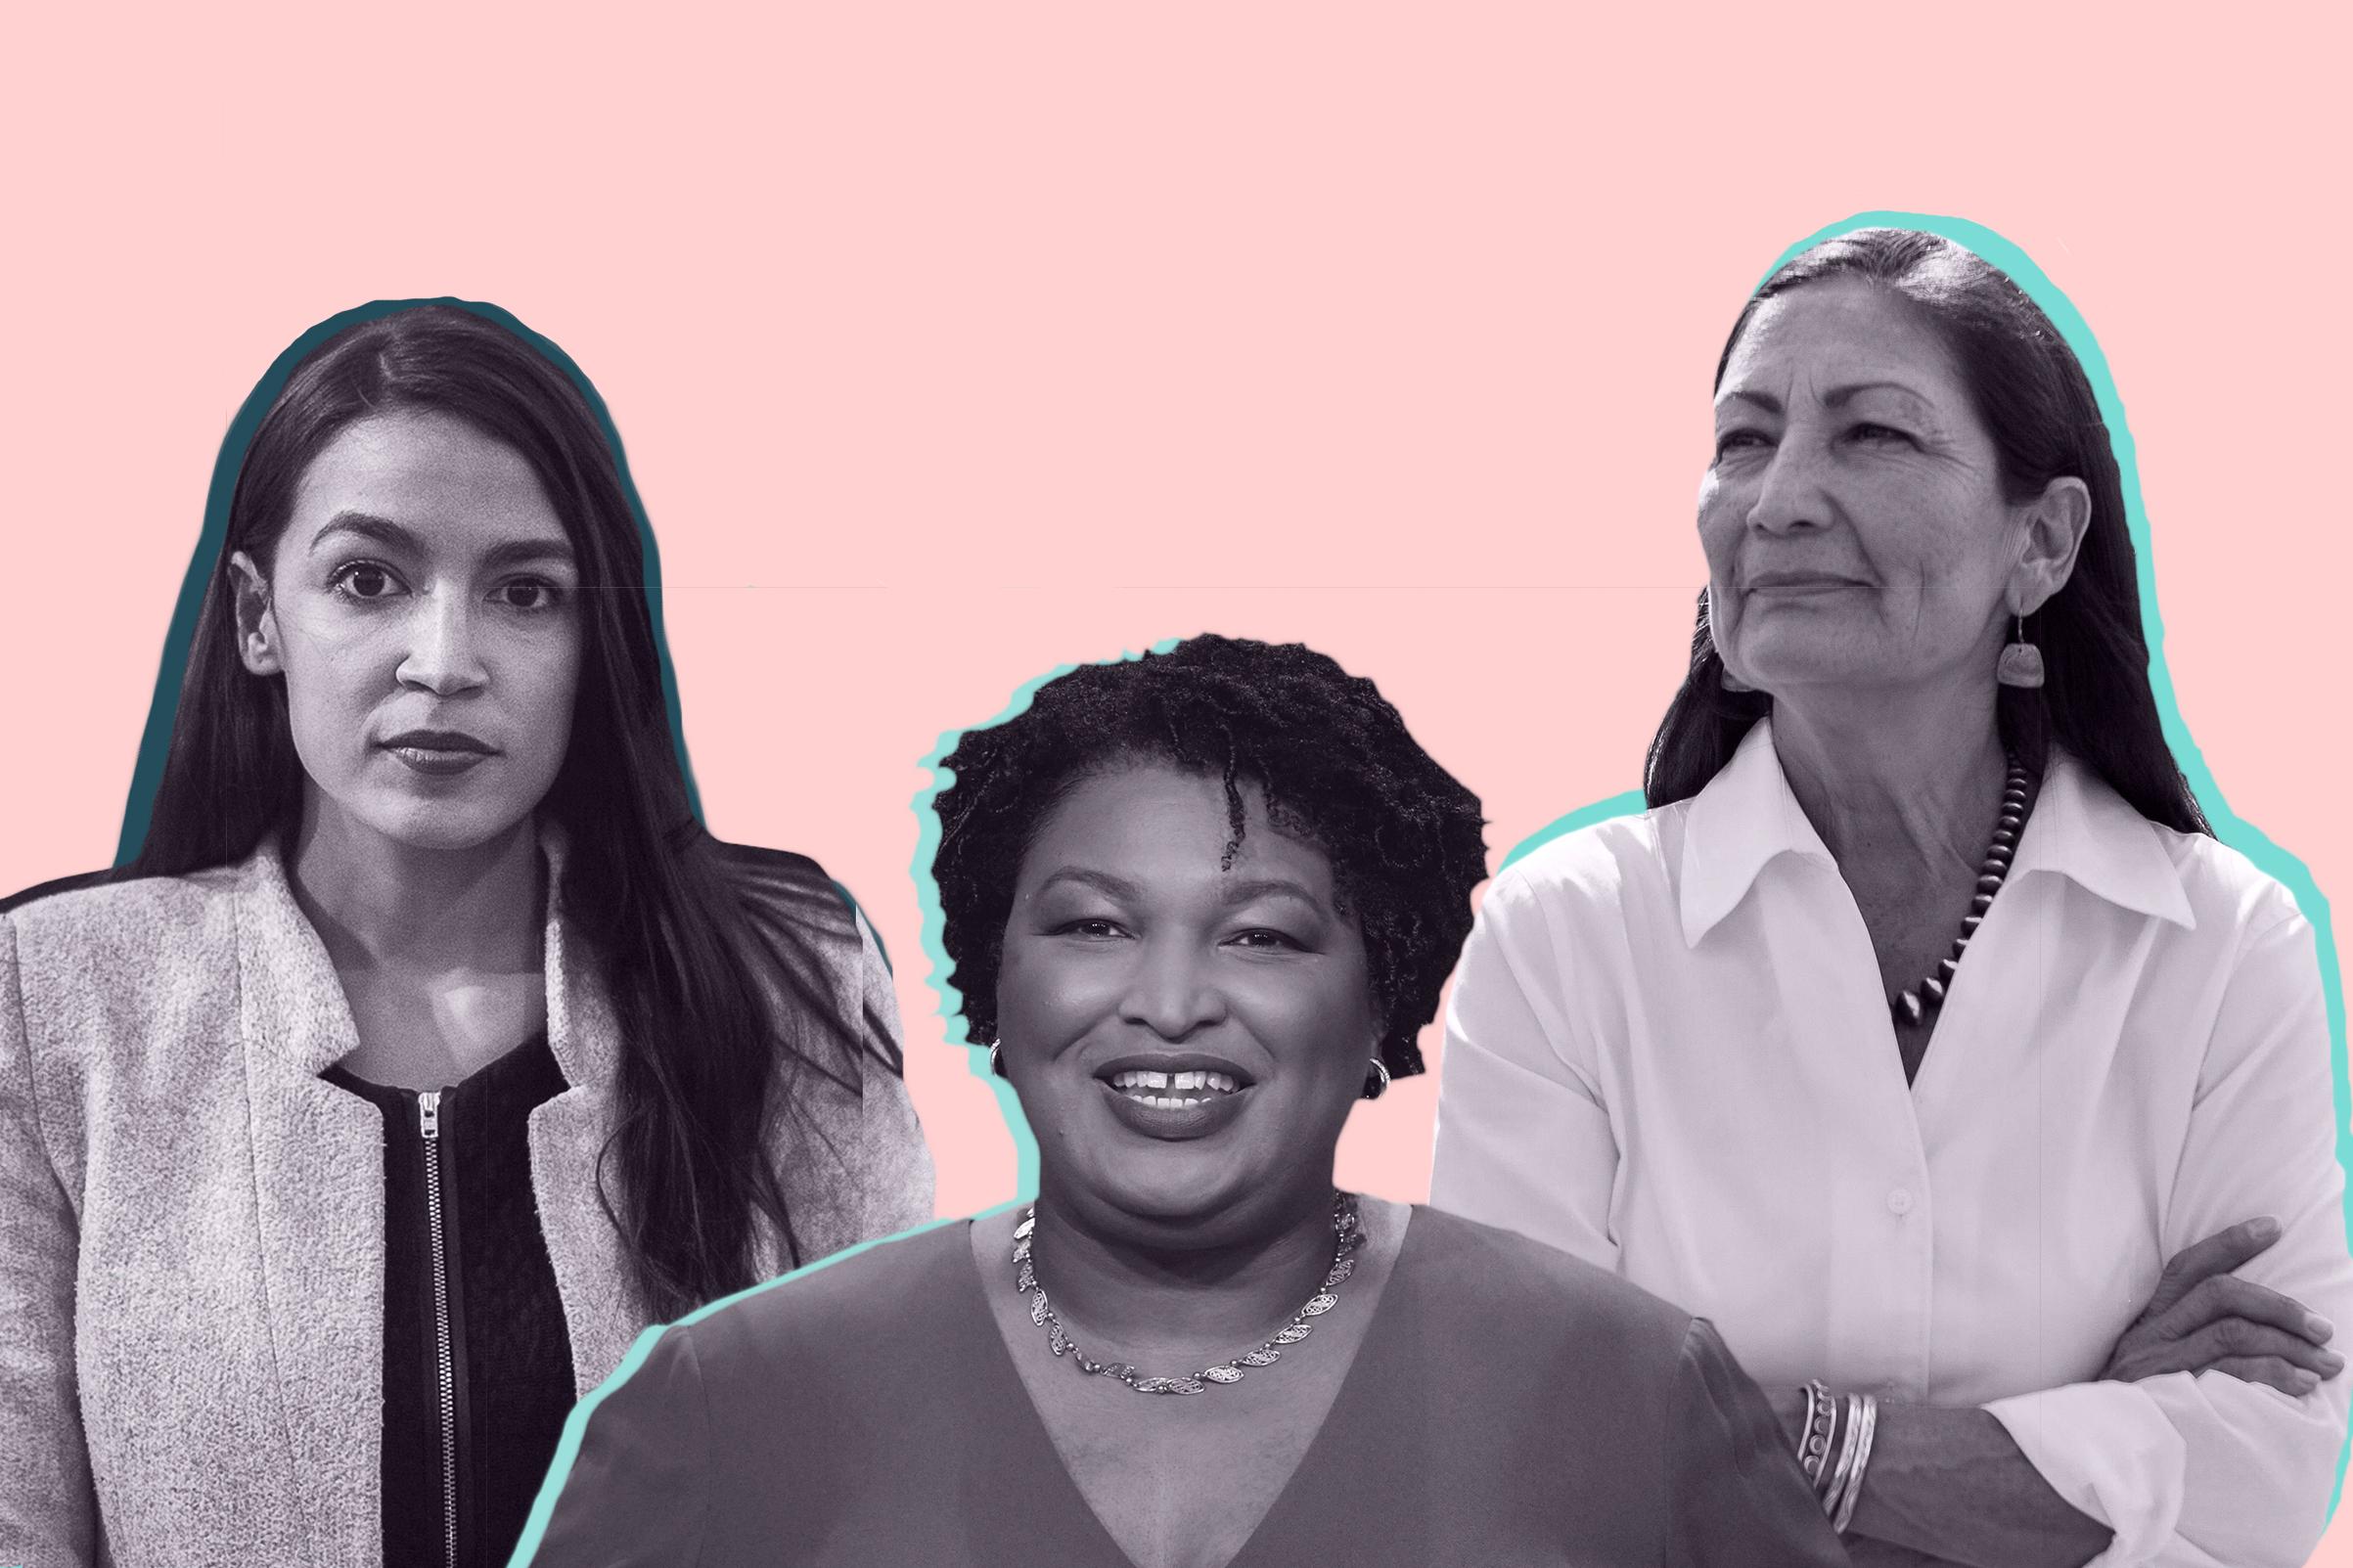 (L to R): Alexandria Ocasio-Cortez, Stacey Abrams, Debb Haaland